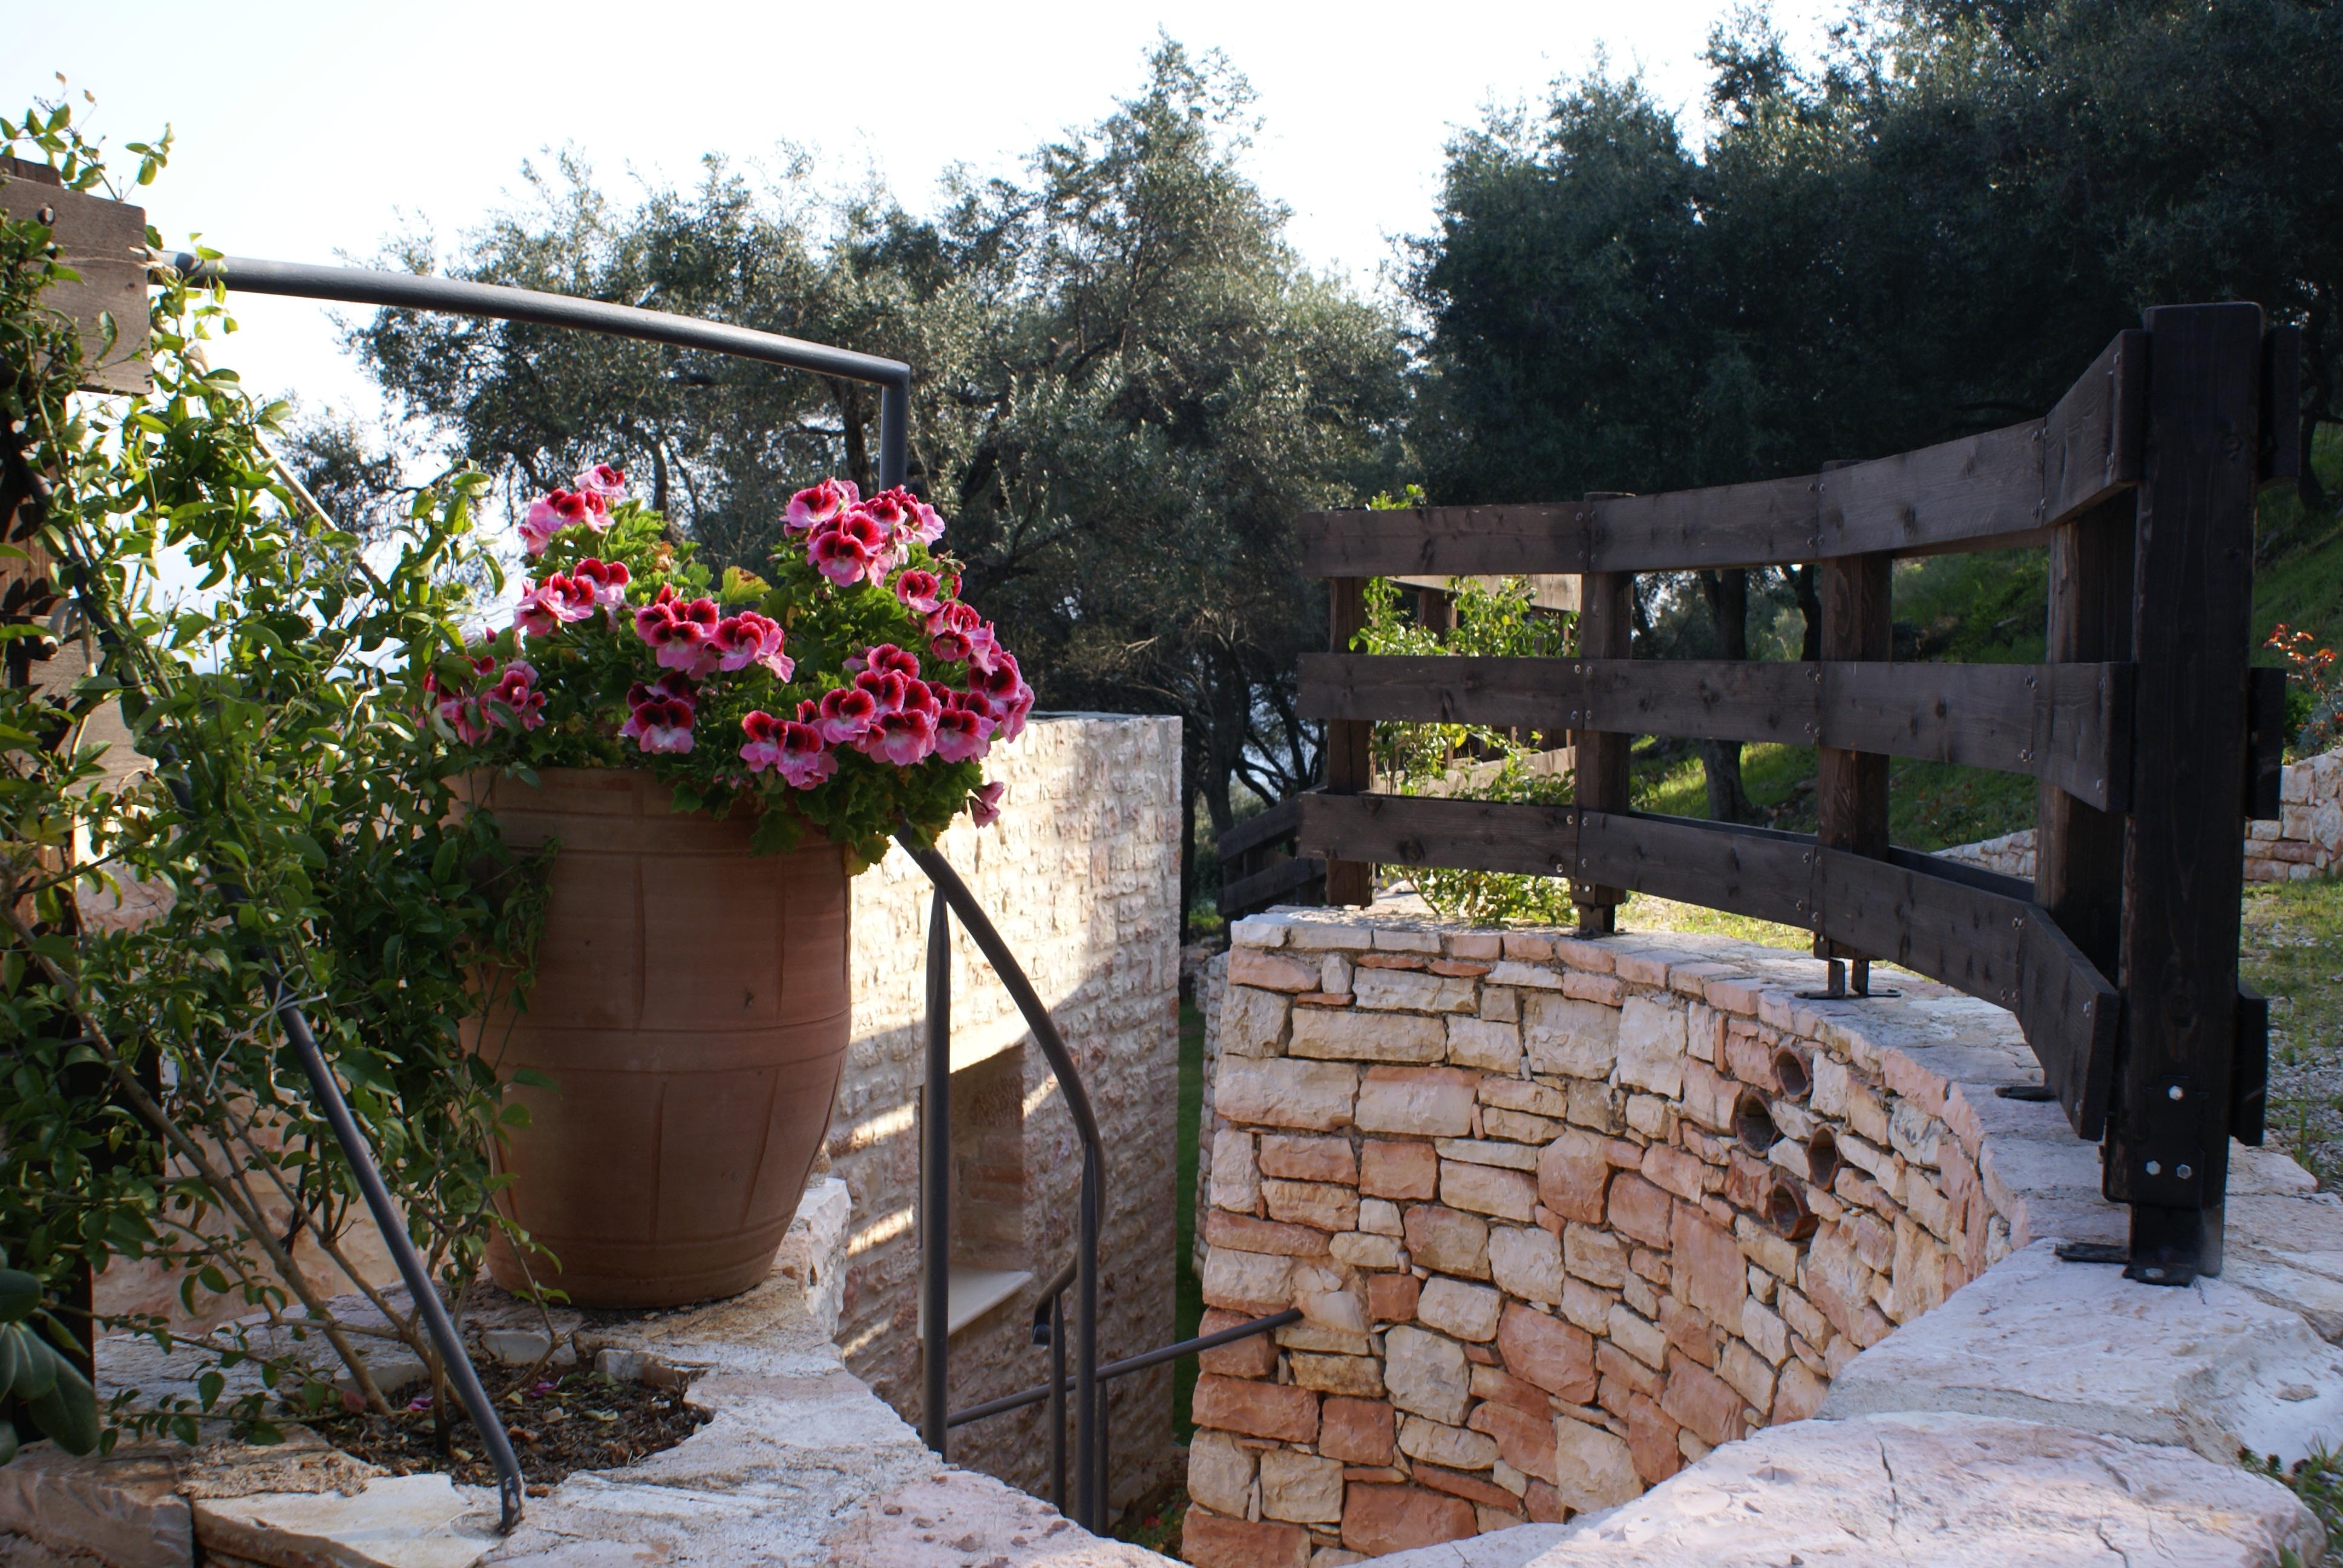 Eingang - Korfu Villa Steilküste, Agios Spiridon, Korfu, Griechenland